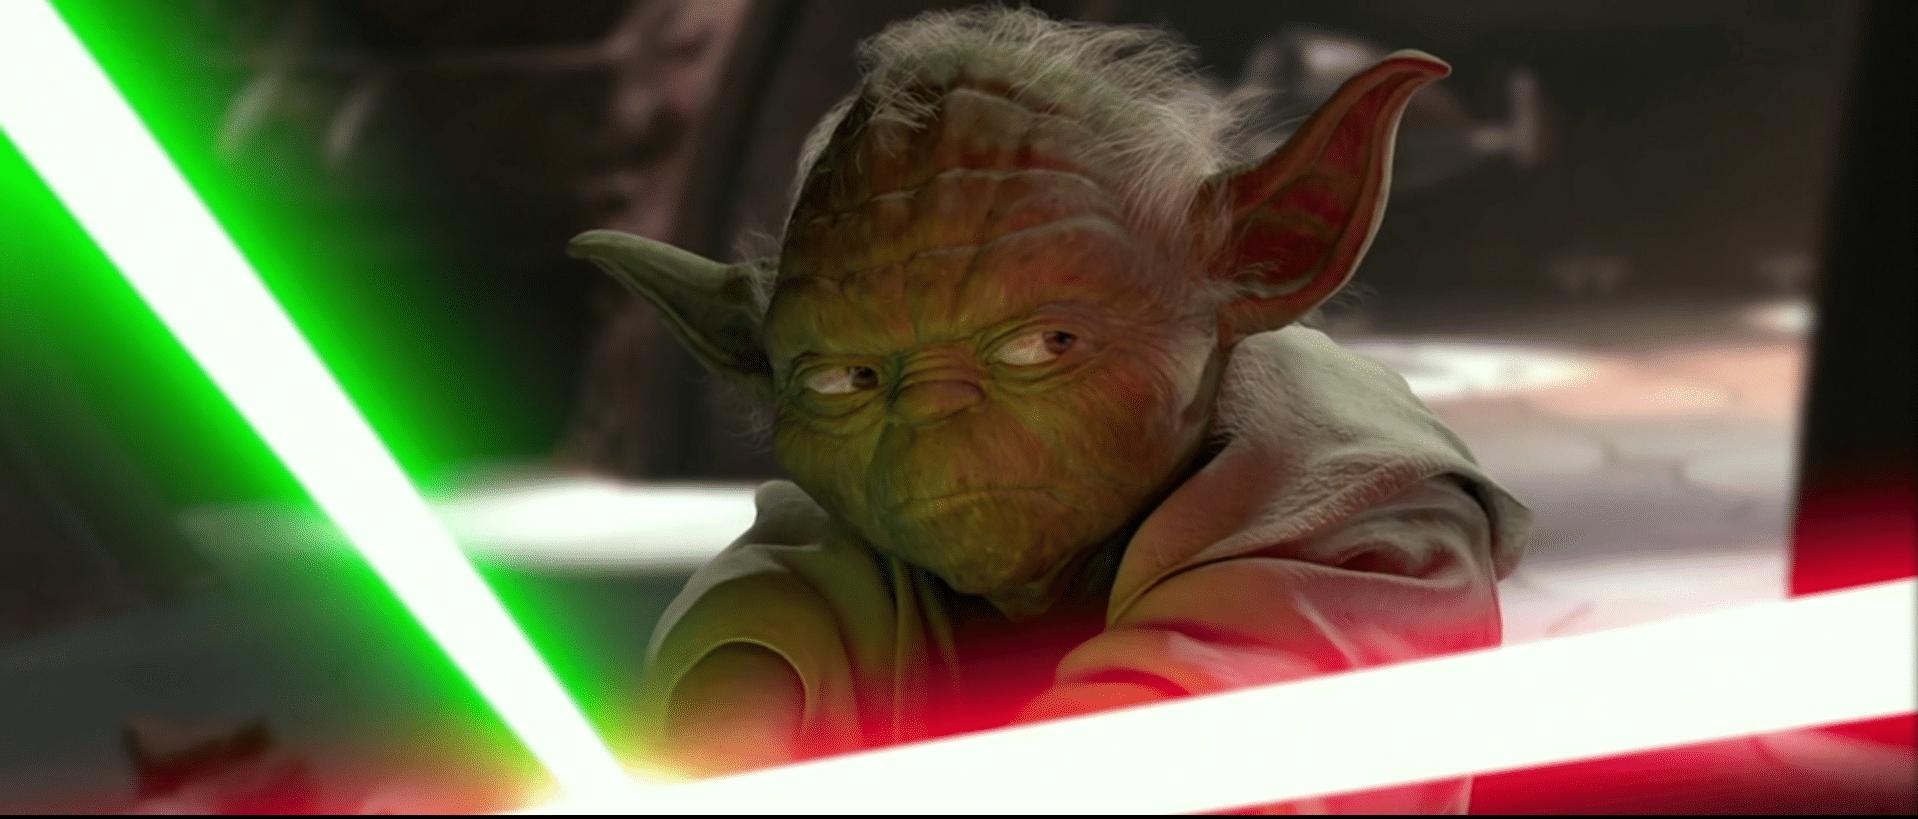 Yoda fights 2